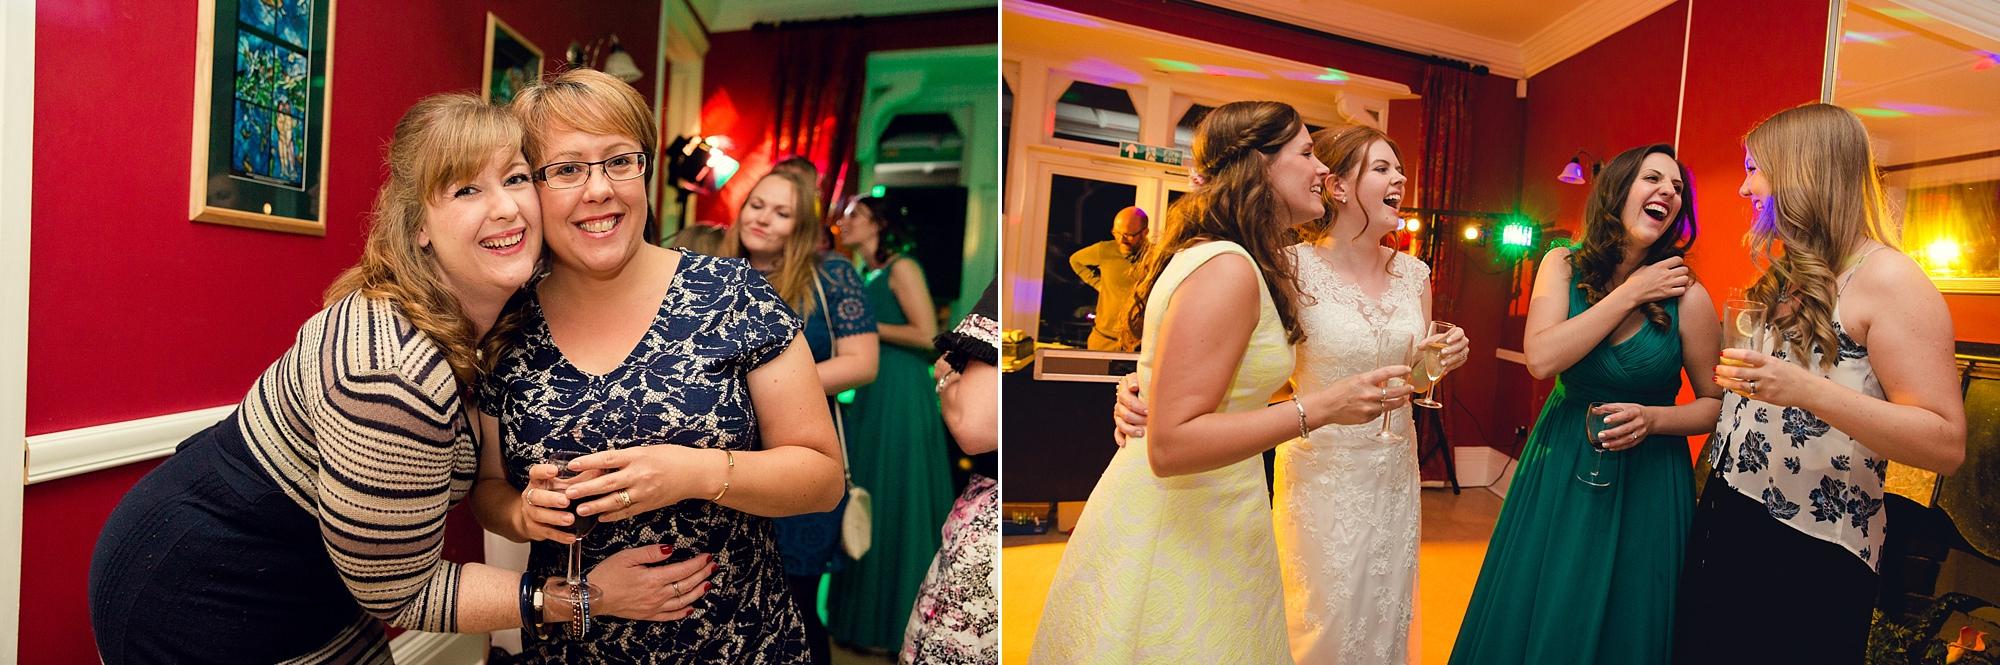 Canon Lane Chichester wedding dancing